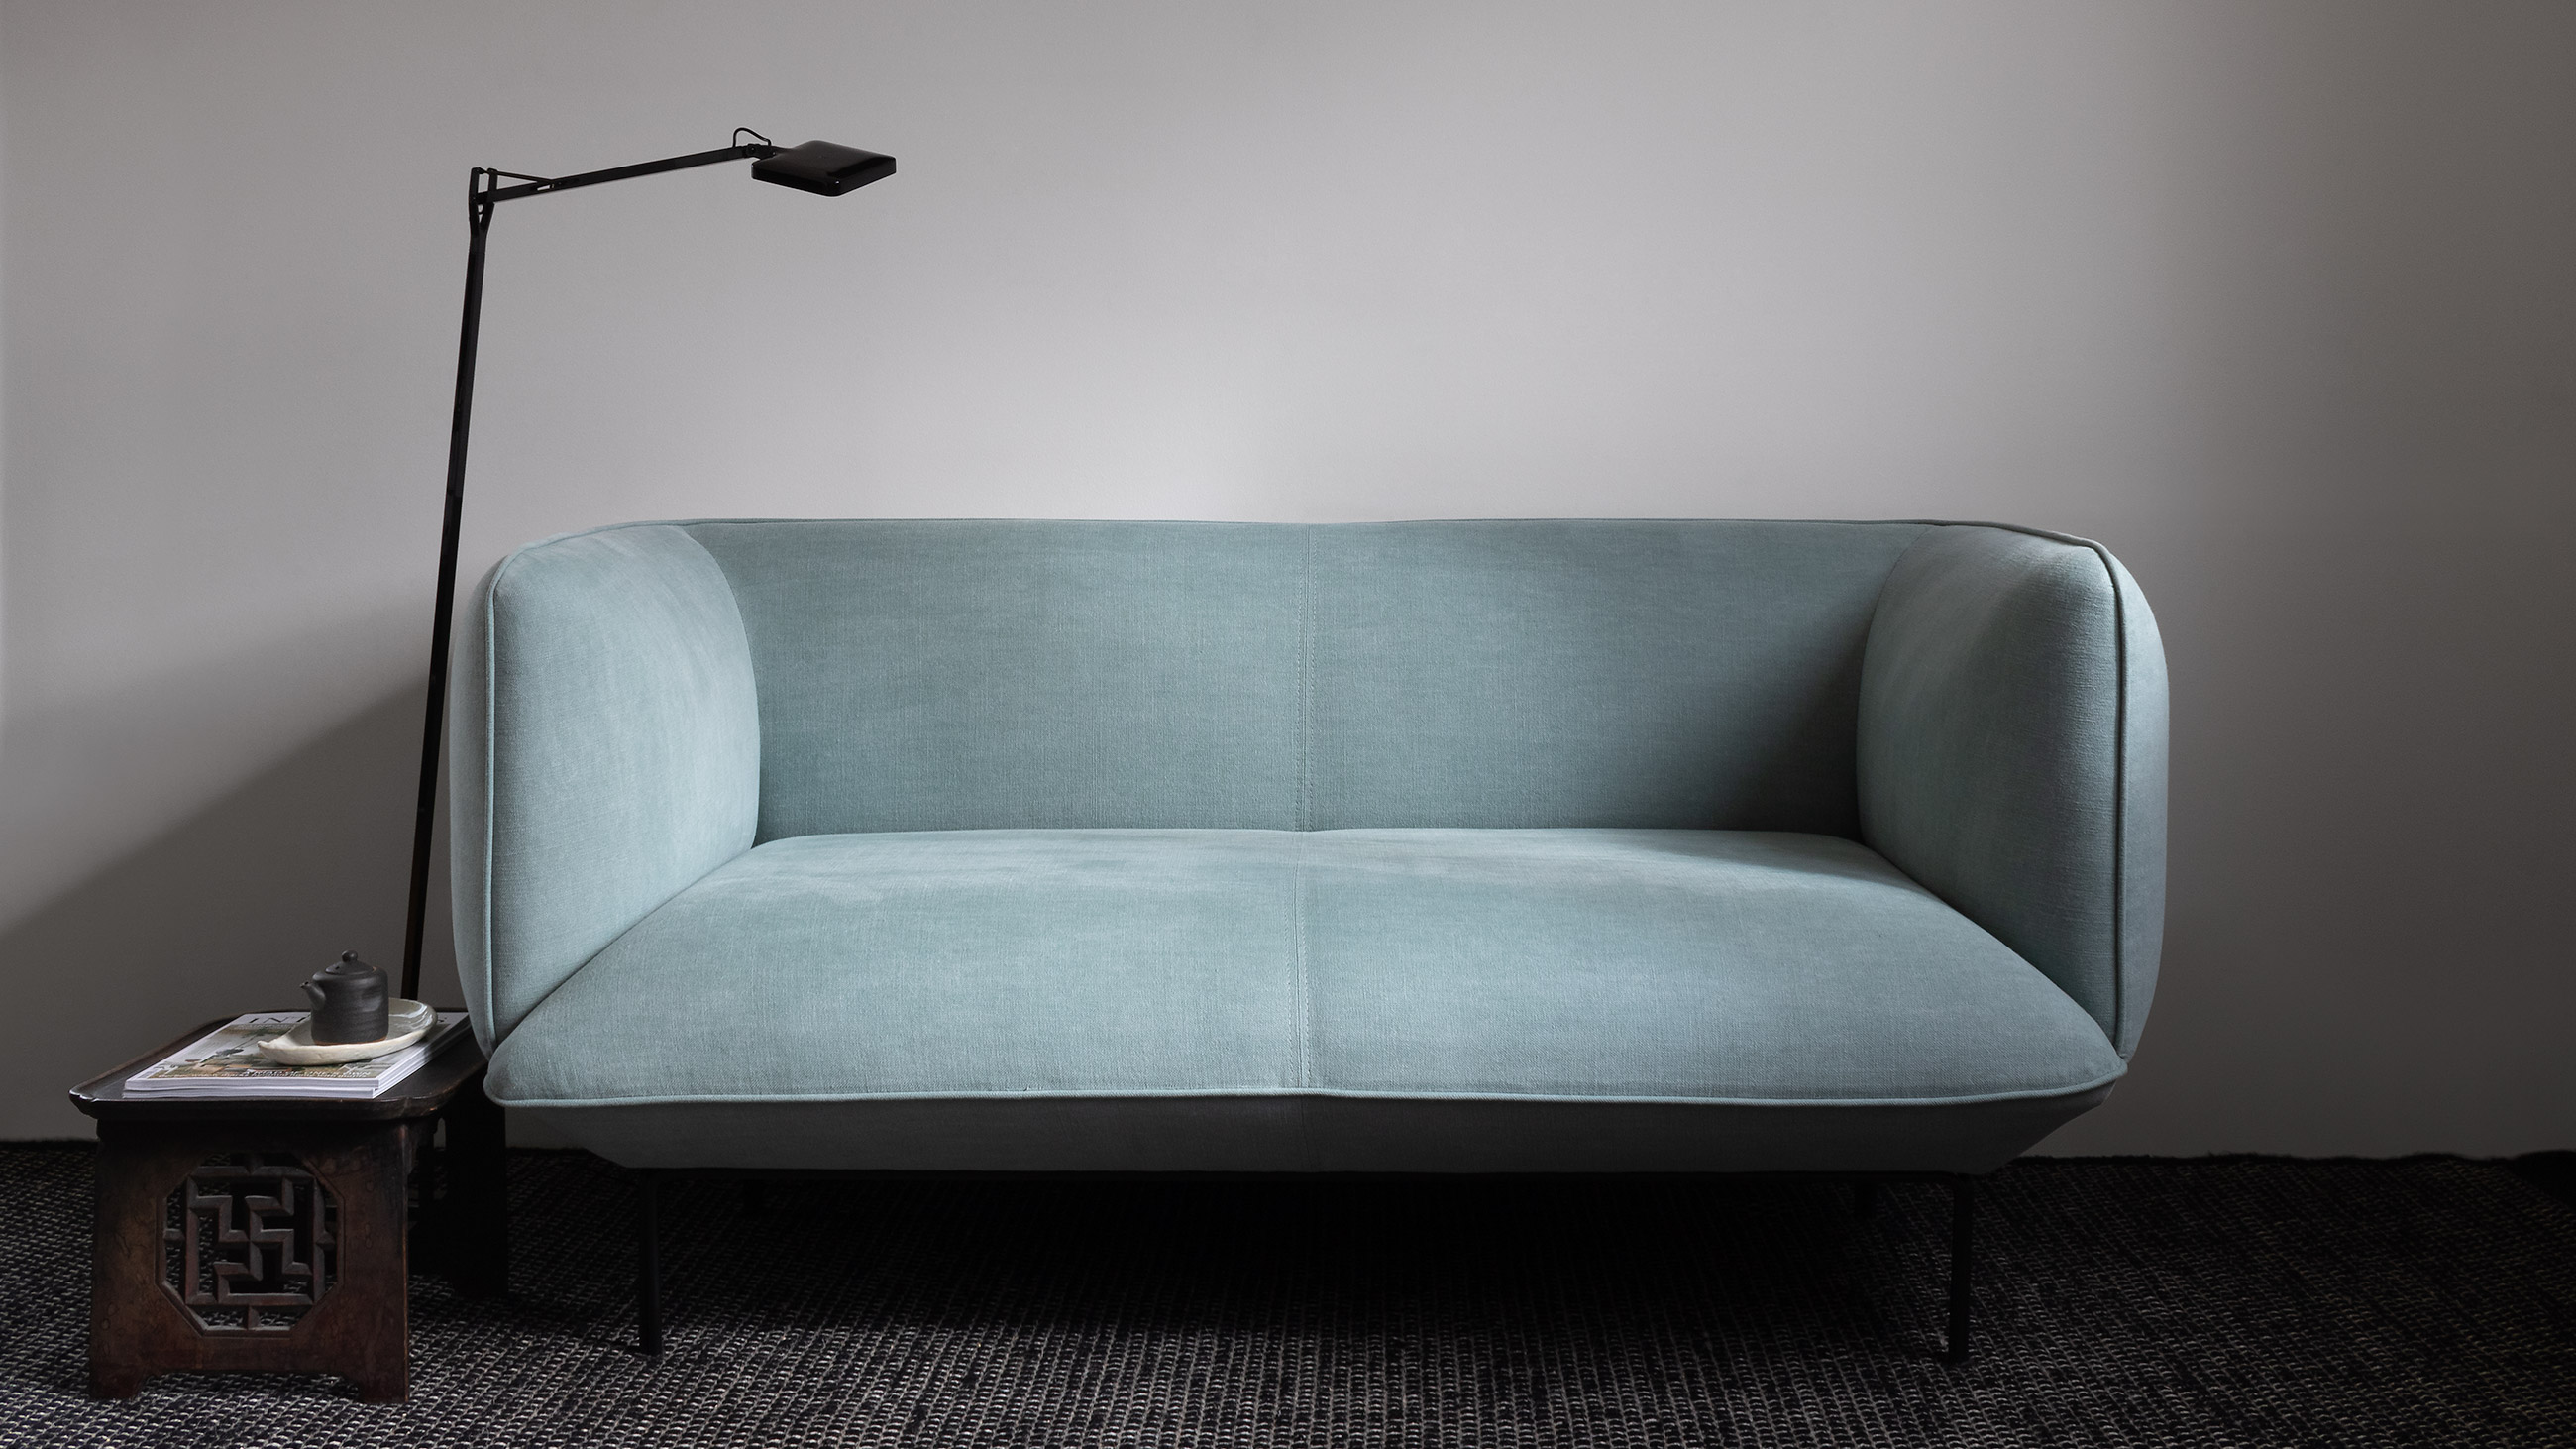 Teal Scandinavian sofa, modern black floor lamp and traditional Japanese tea table on black rug